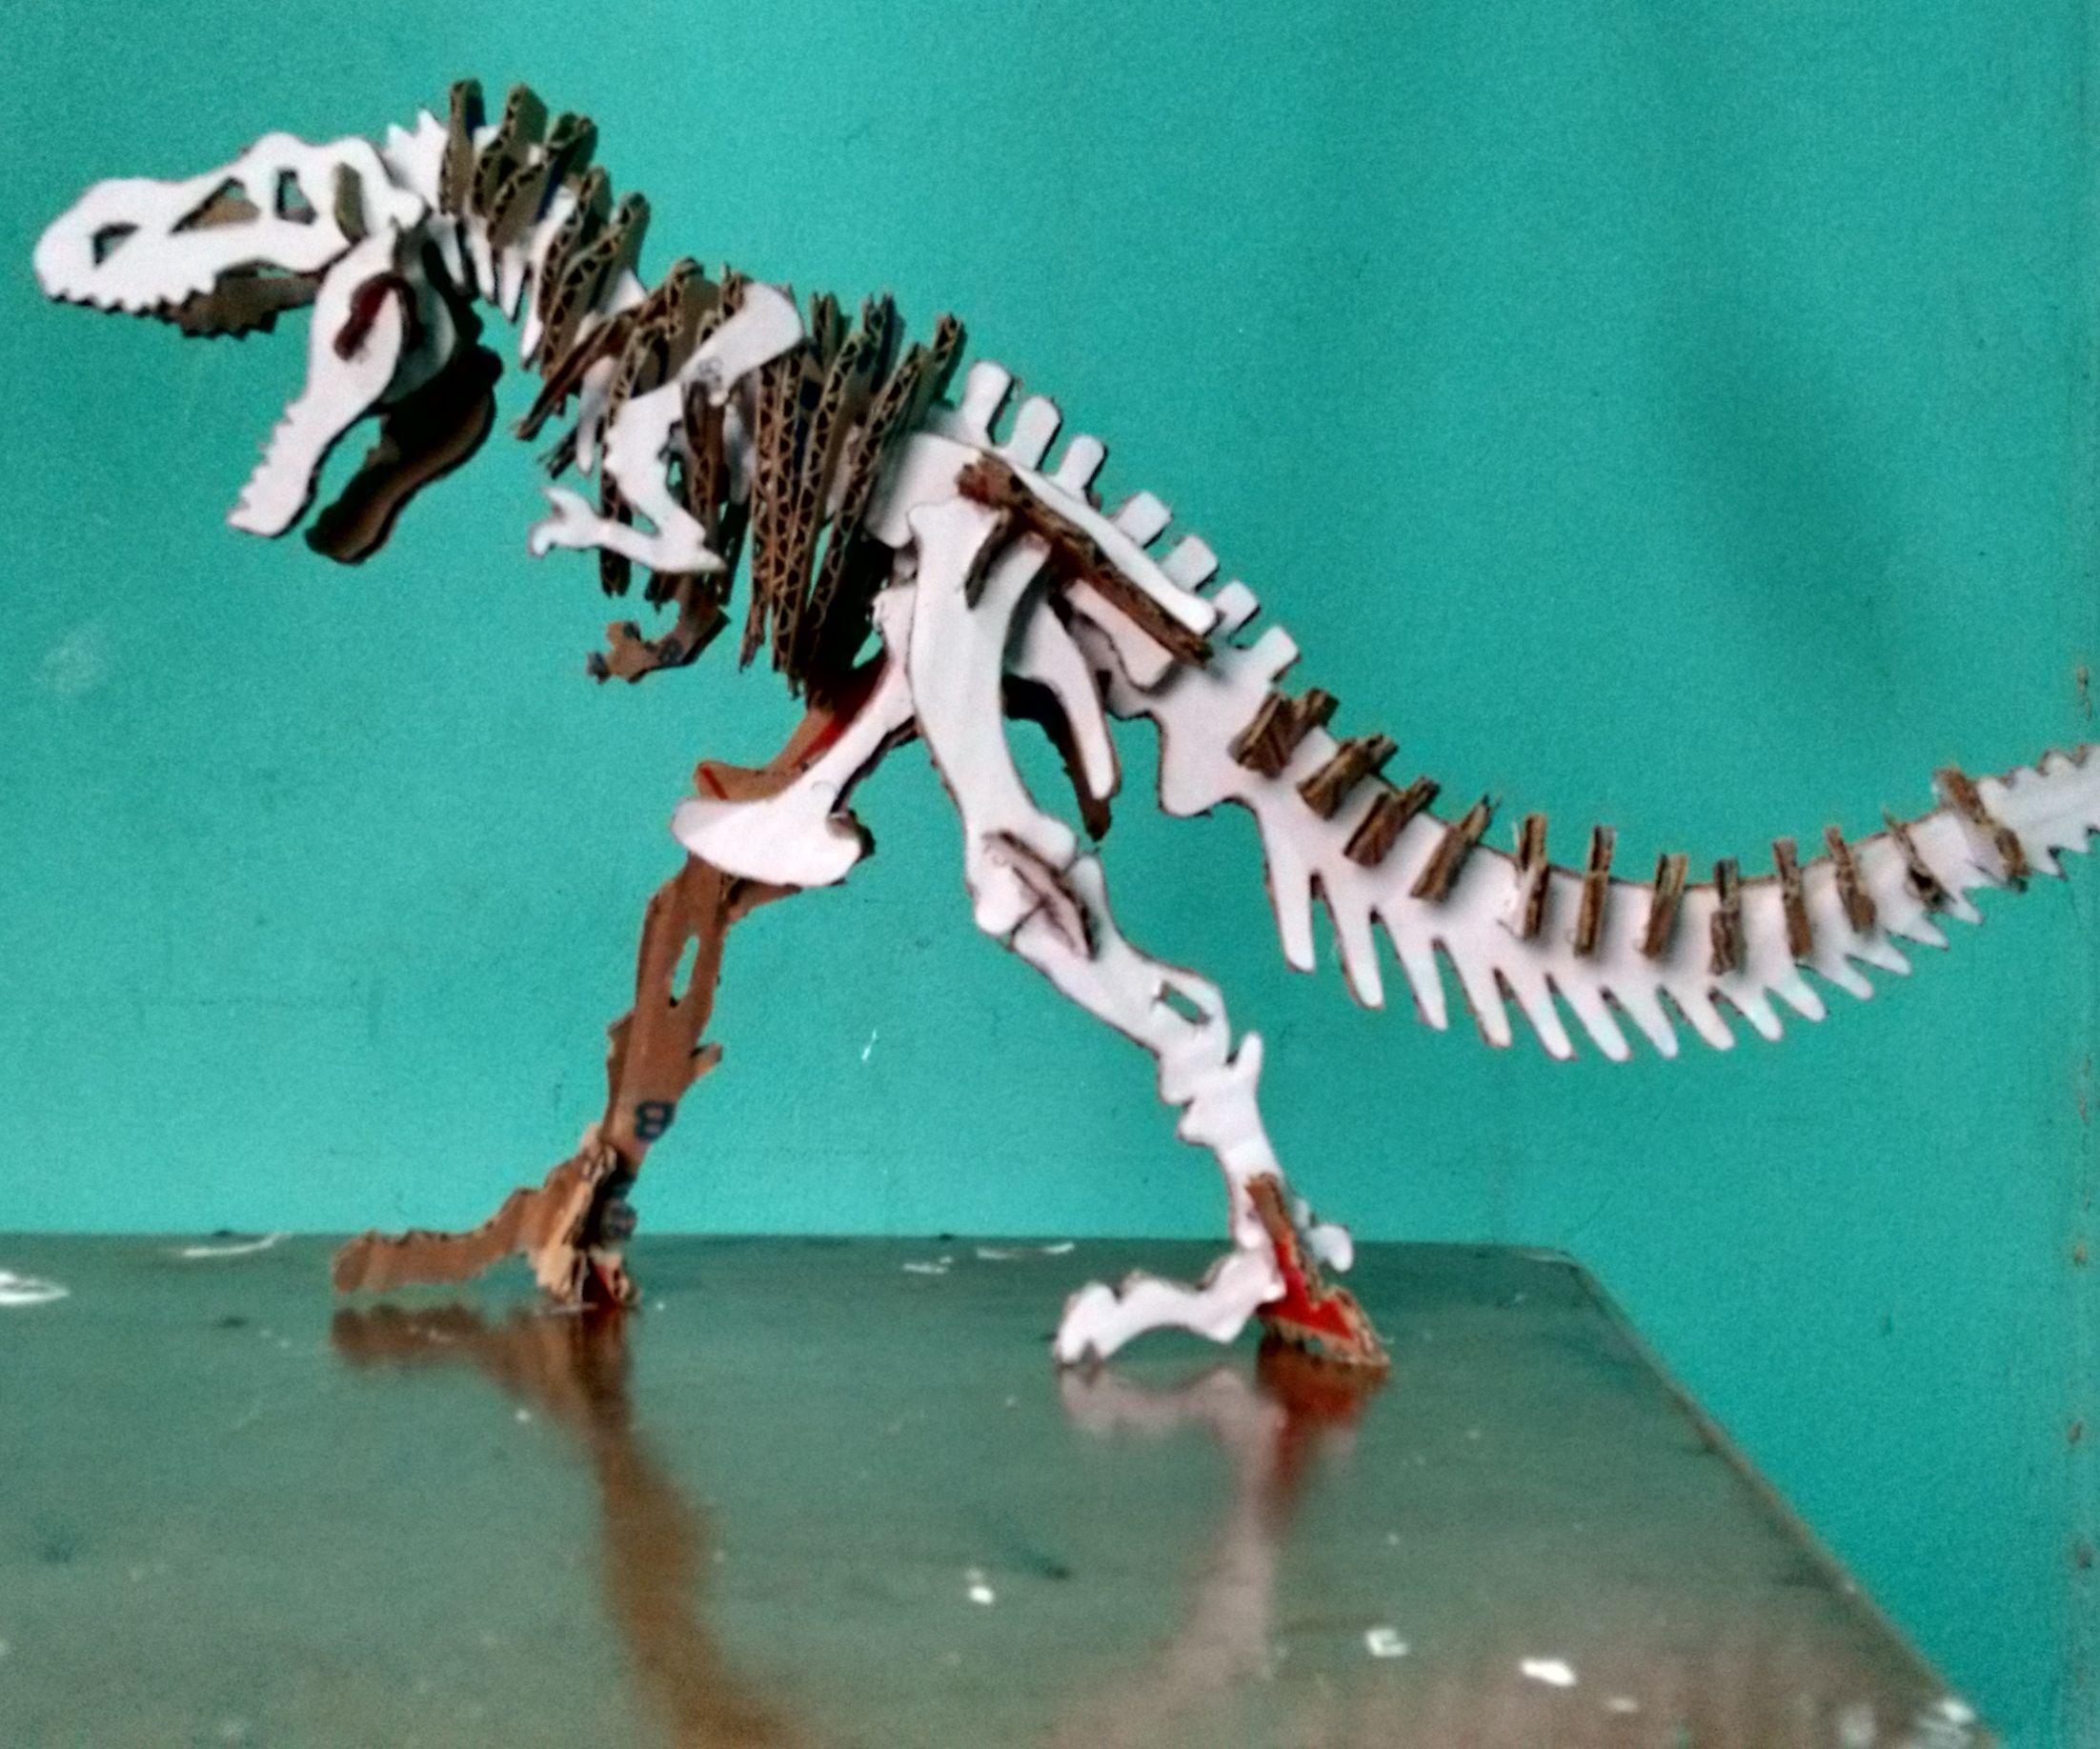 DIY - cardboard dinosaur skeleton (Tyrannosaurus Rex)